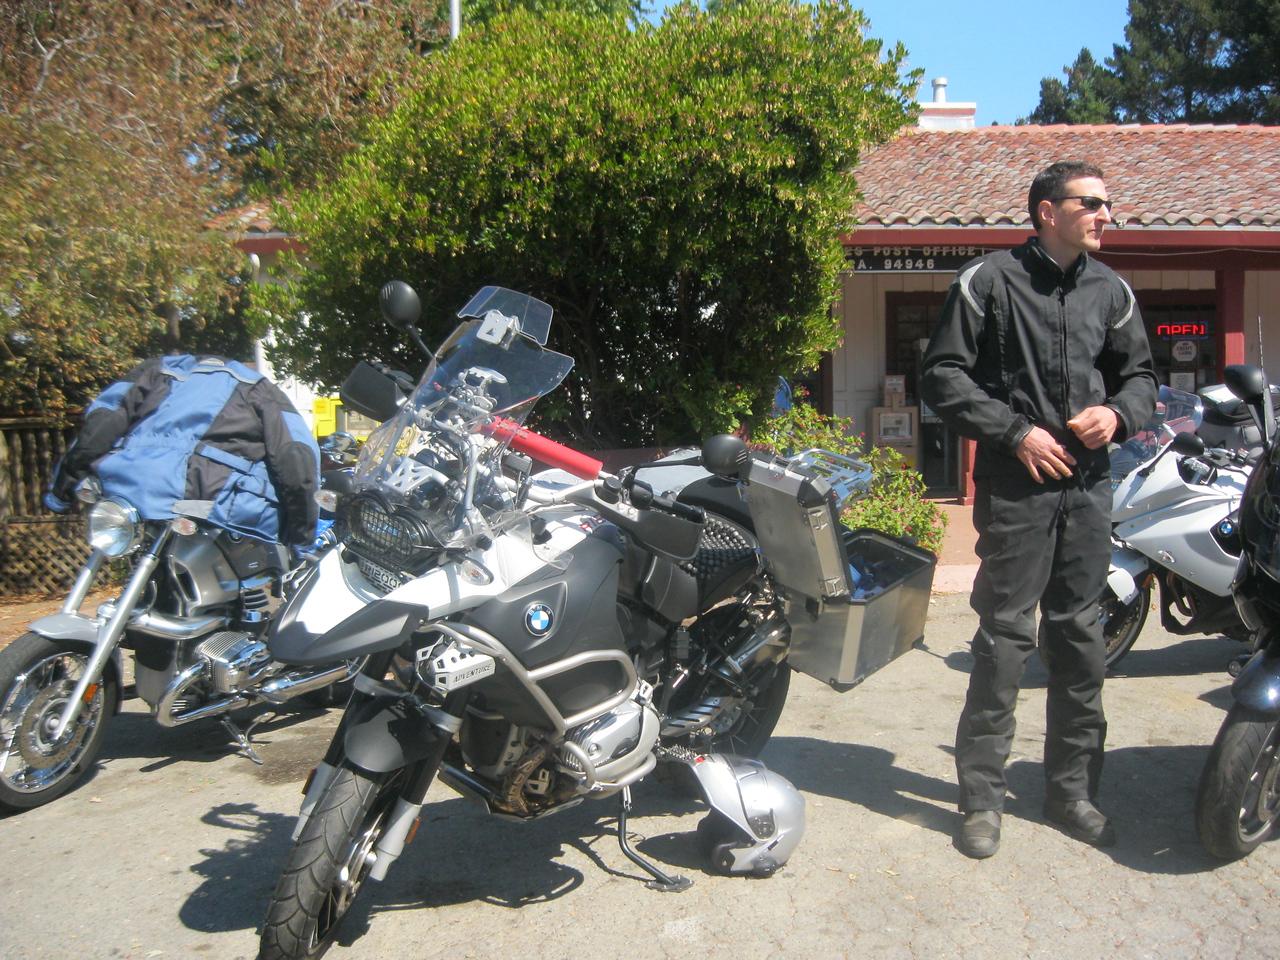 Paul Boco and his R1200GSA